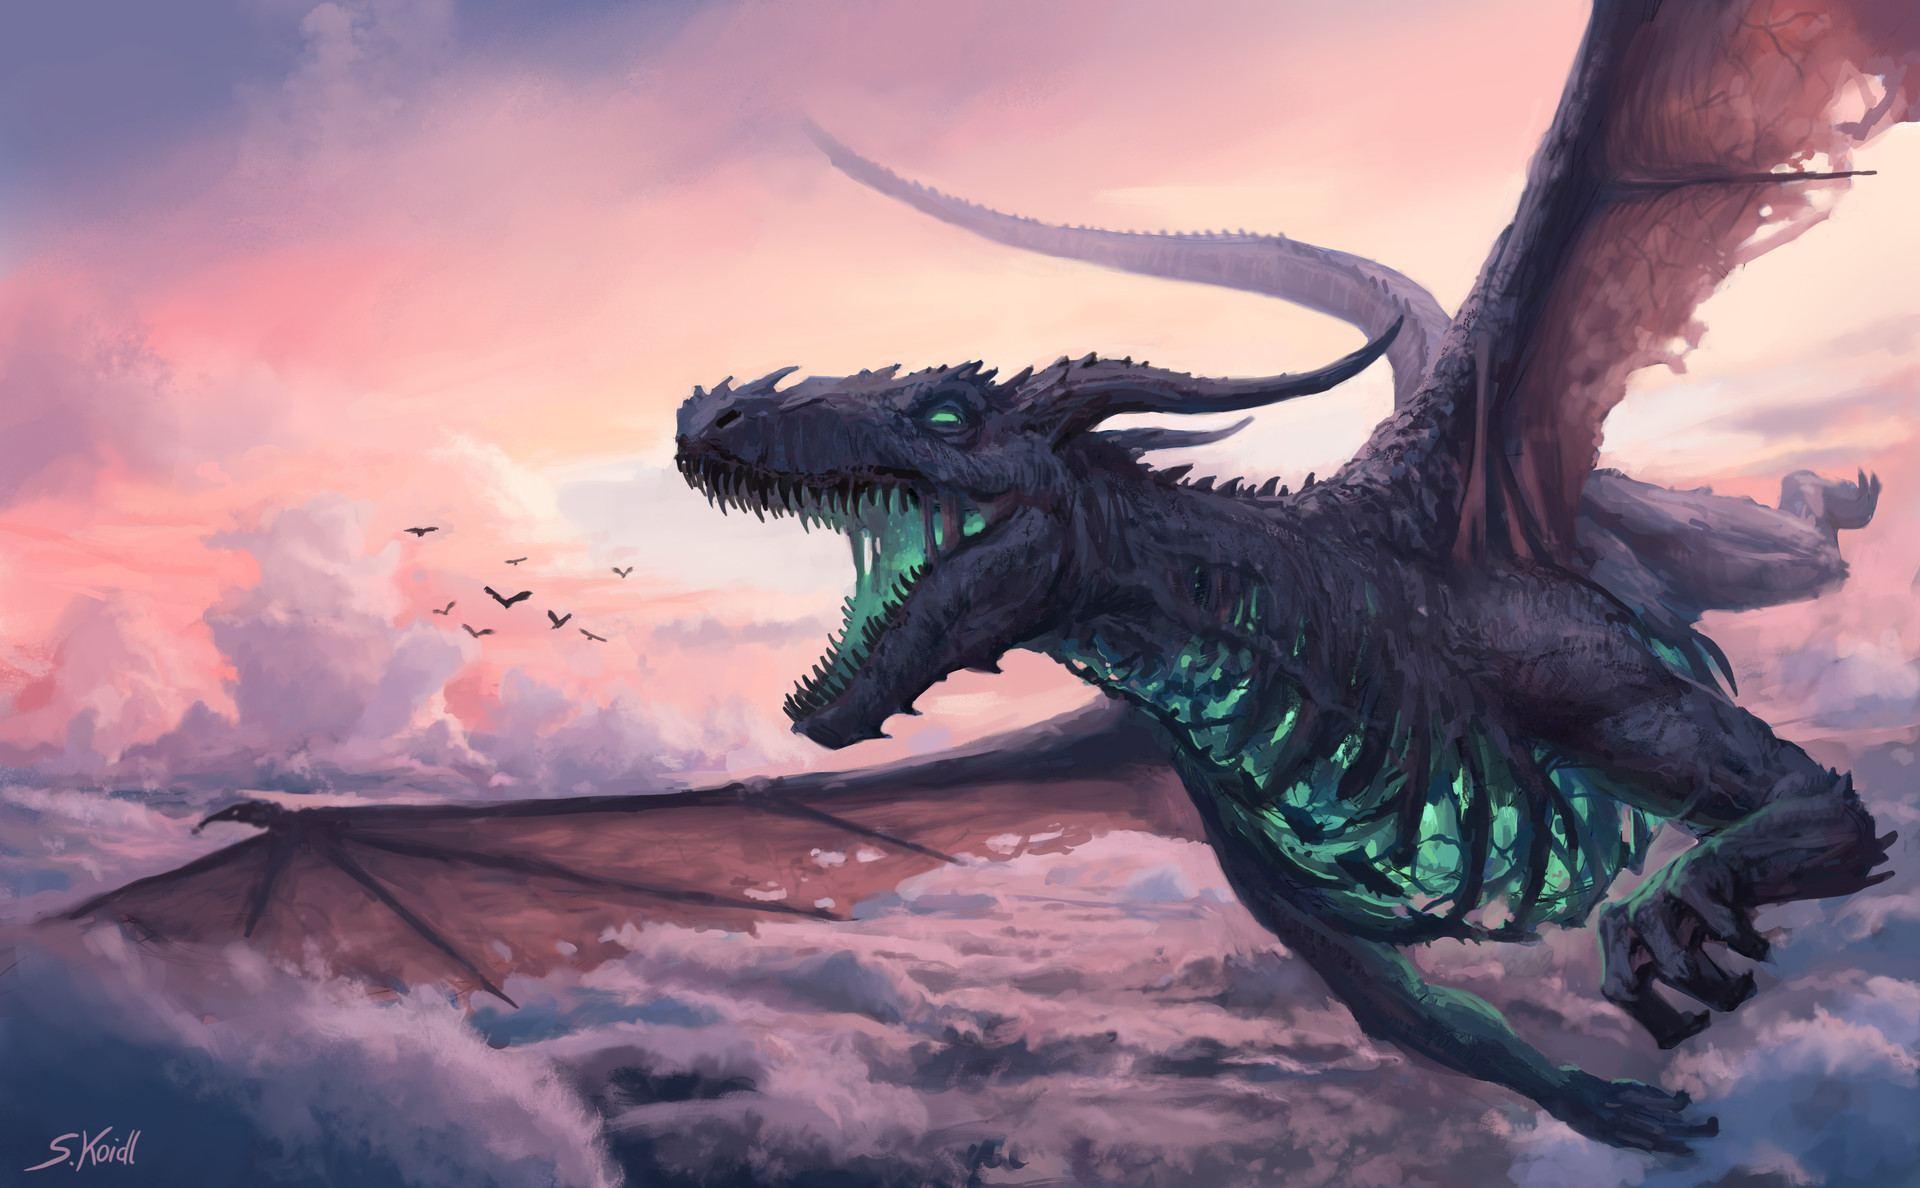 Flying dragon in a lucid dream